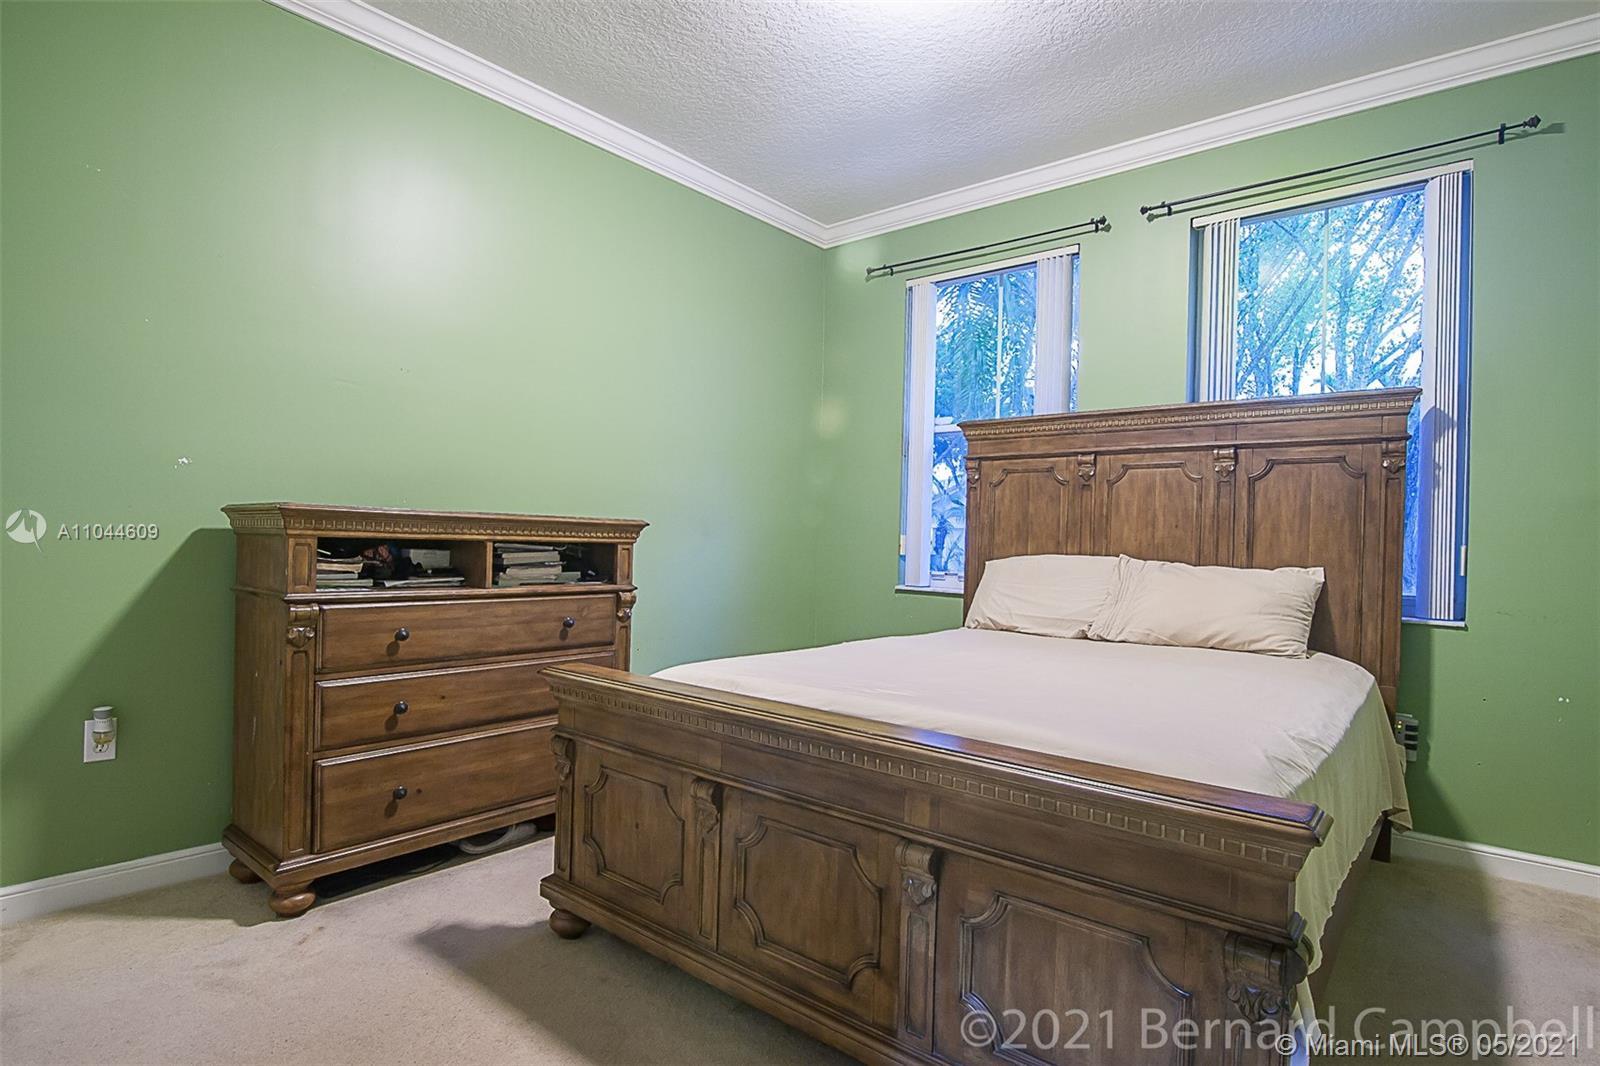 3 / 2 1891 sq. ft. $ 2021-05-19 0 Photo